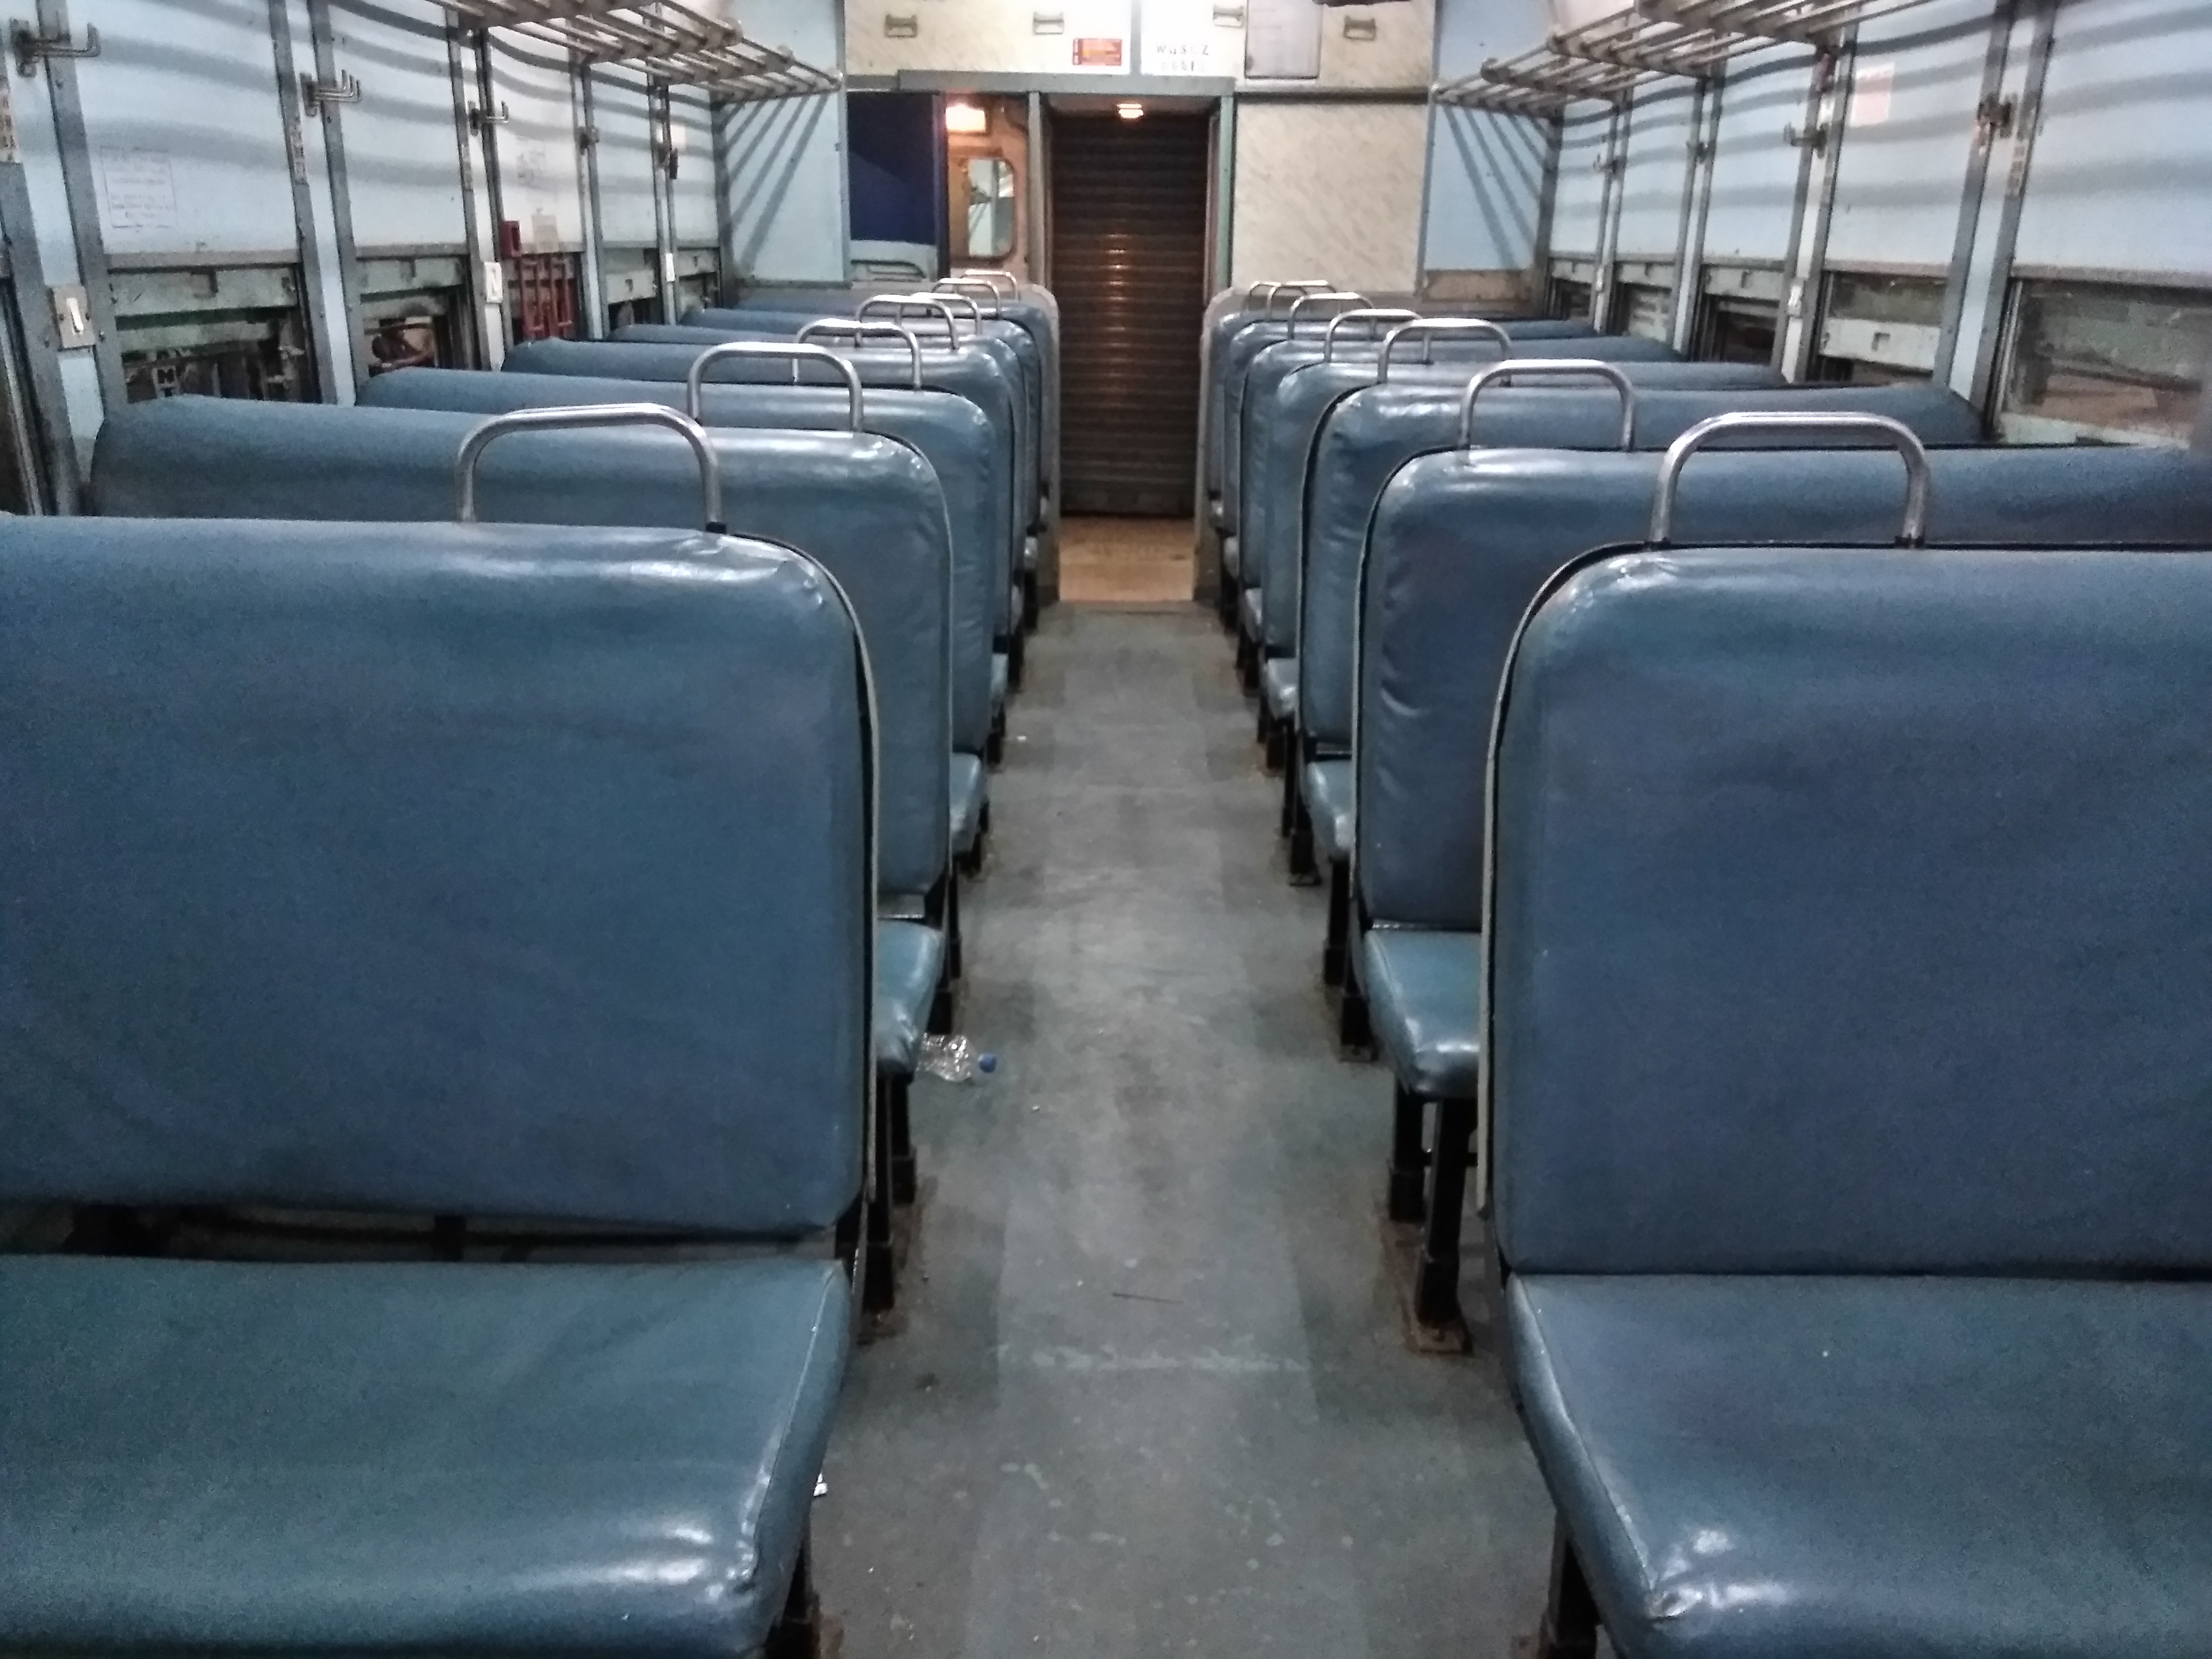 File:Seats inside Indian train jpg - Wikimedia Commons